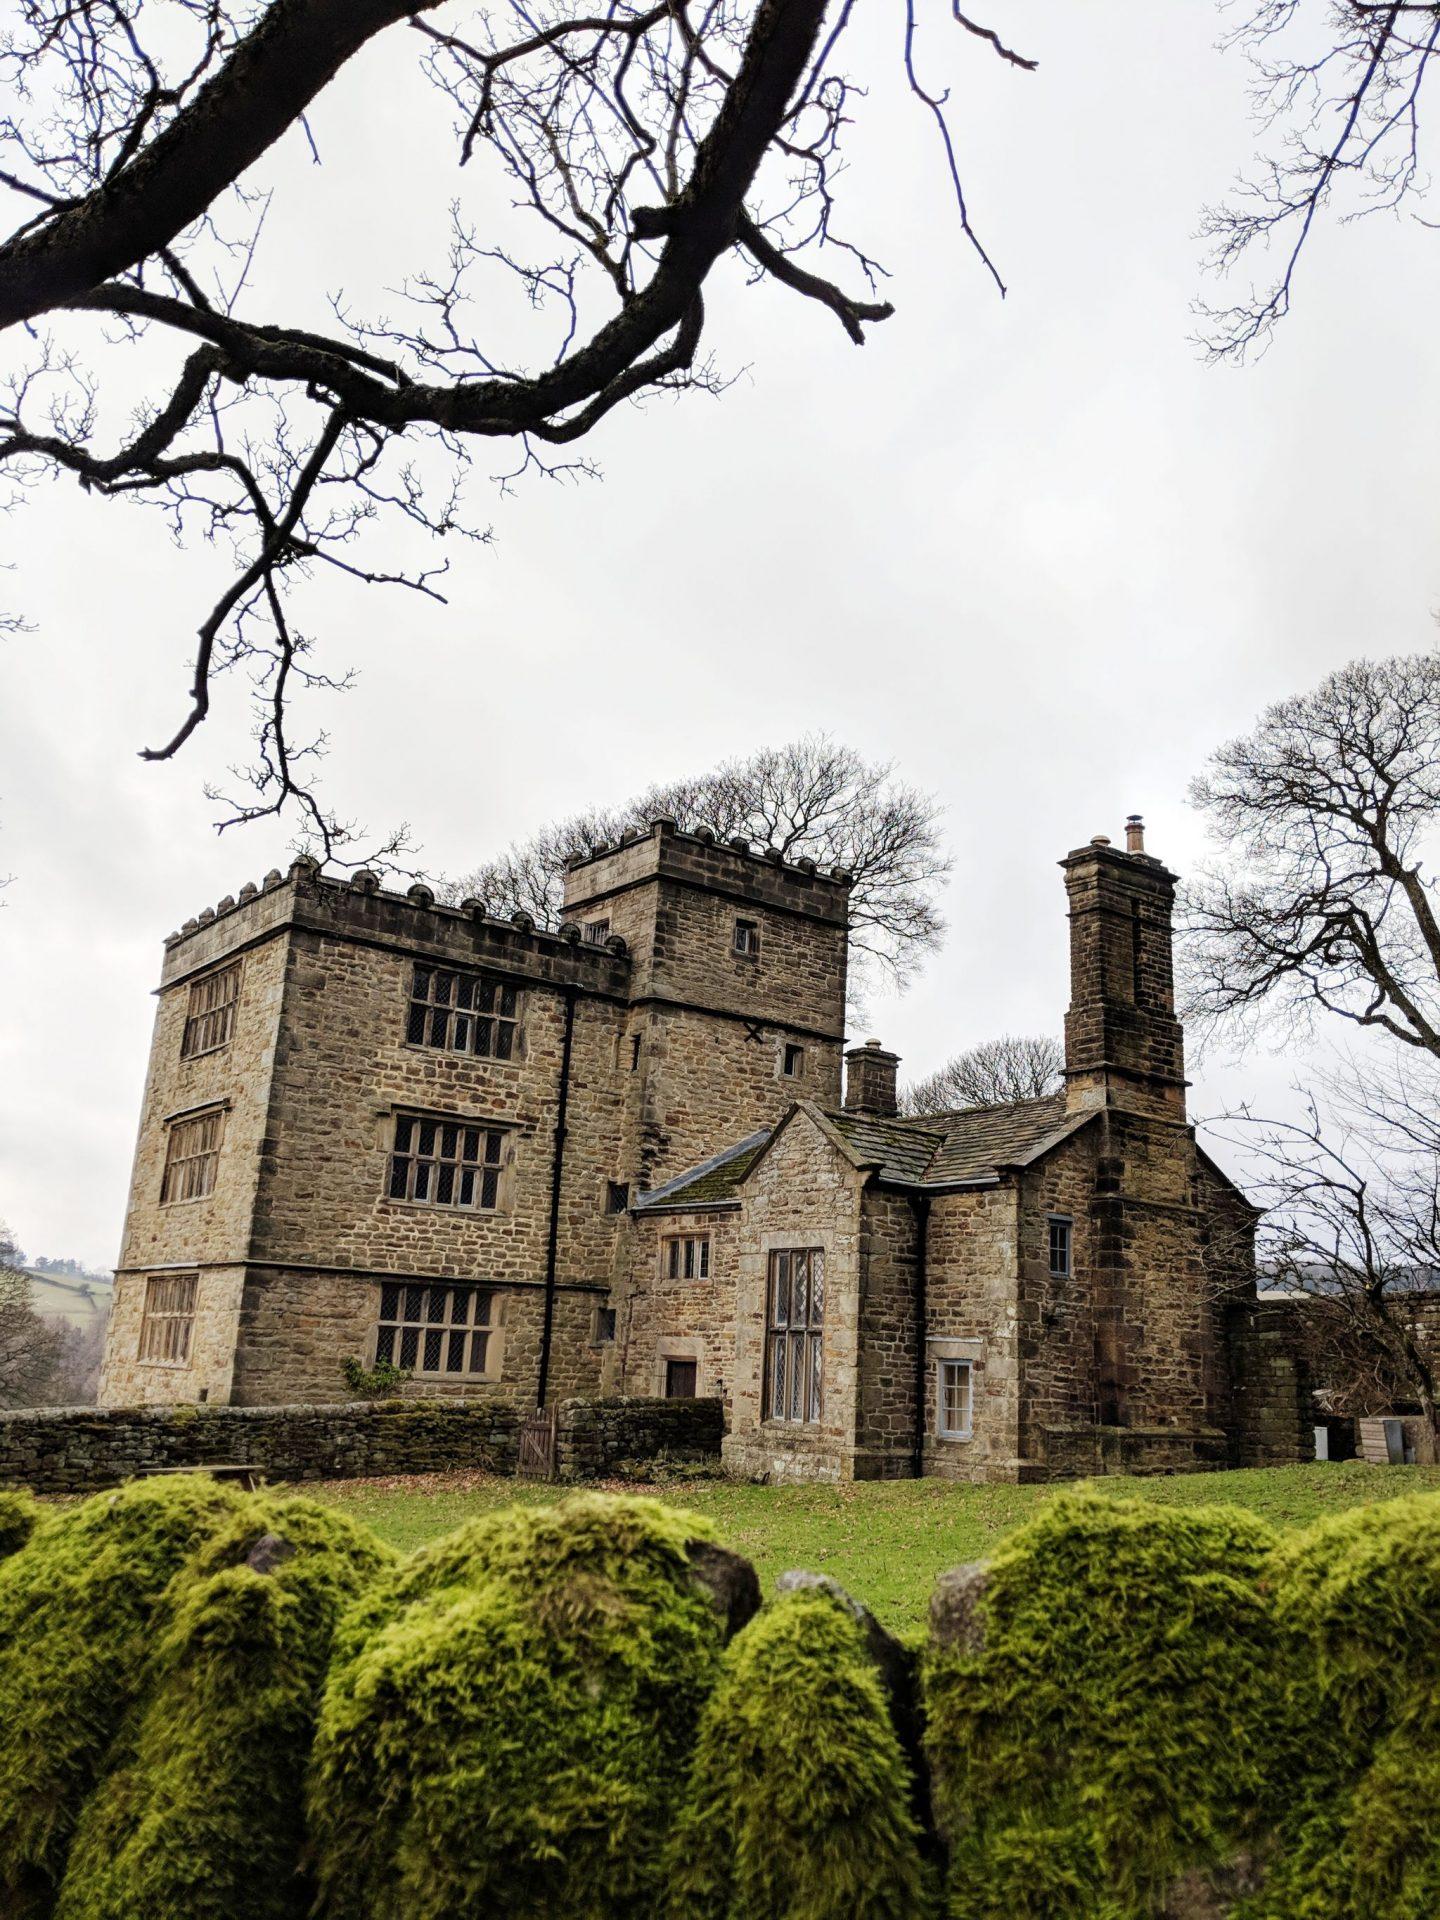 North Lees Hall (Thornfield Hall) on the Jane Eyre Trail